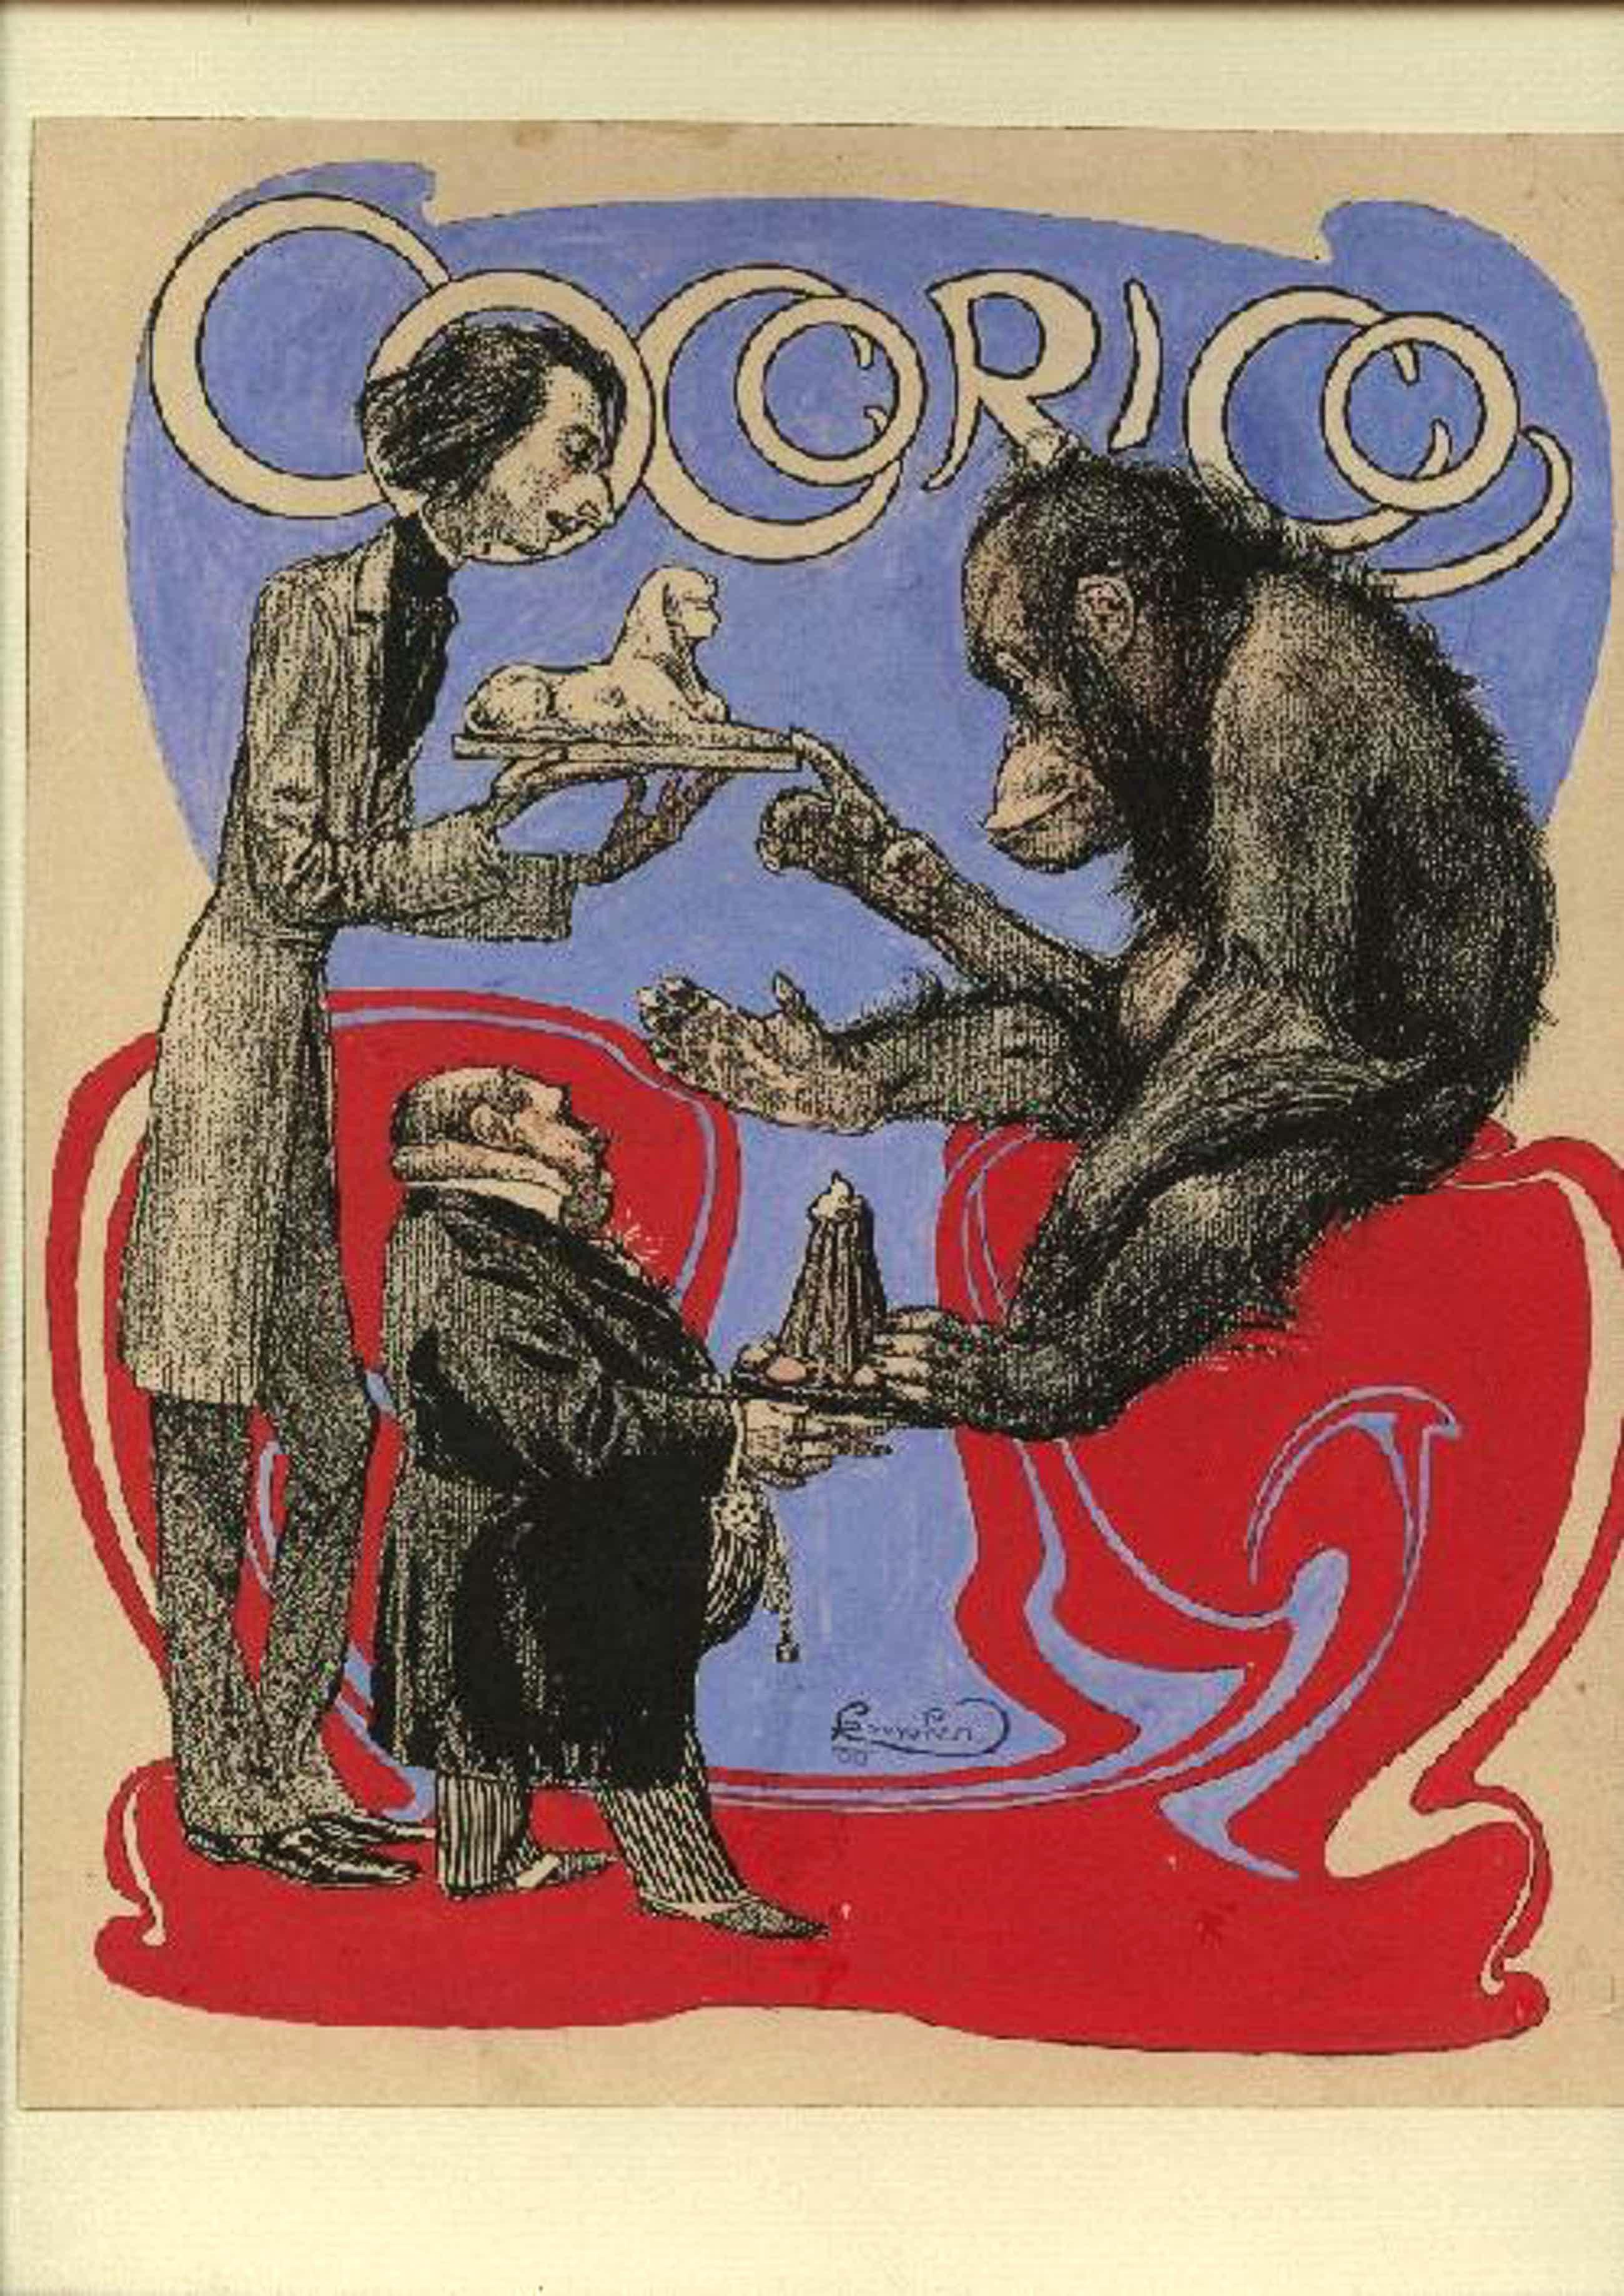 Frantisek Kupka - FRANTISEK KUPKA, Illustration zu Cocorico, signiert kopen? Bied vanaf 3000!